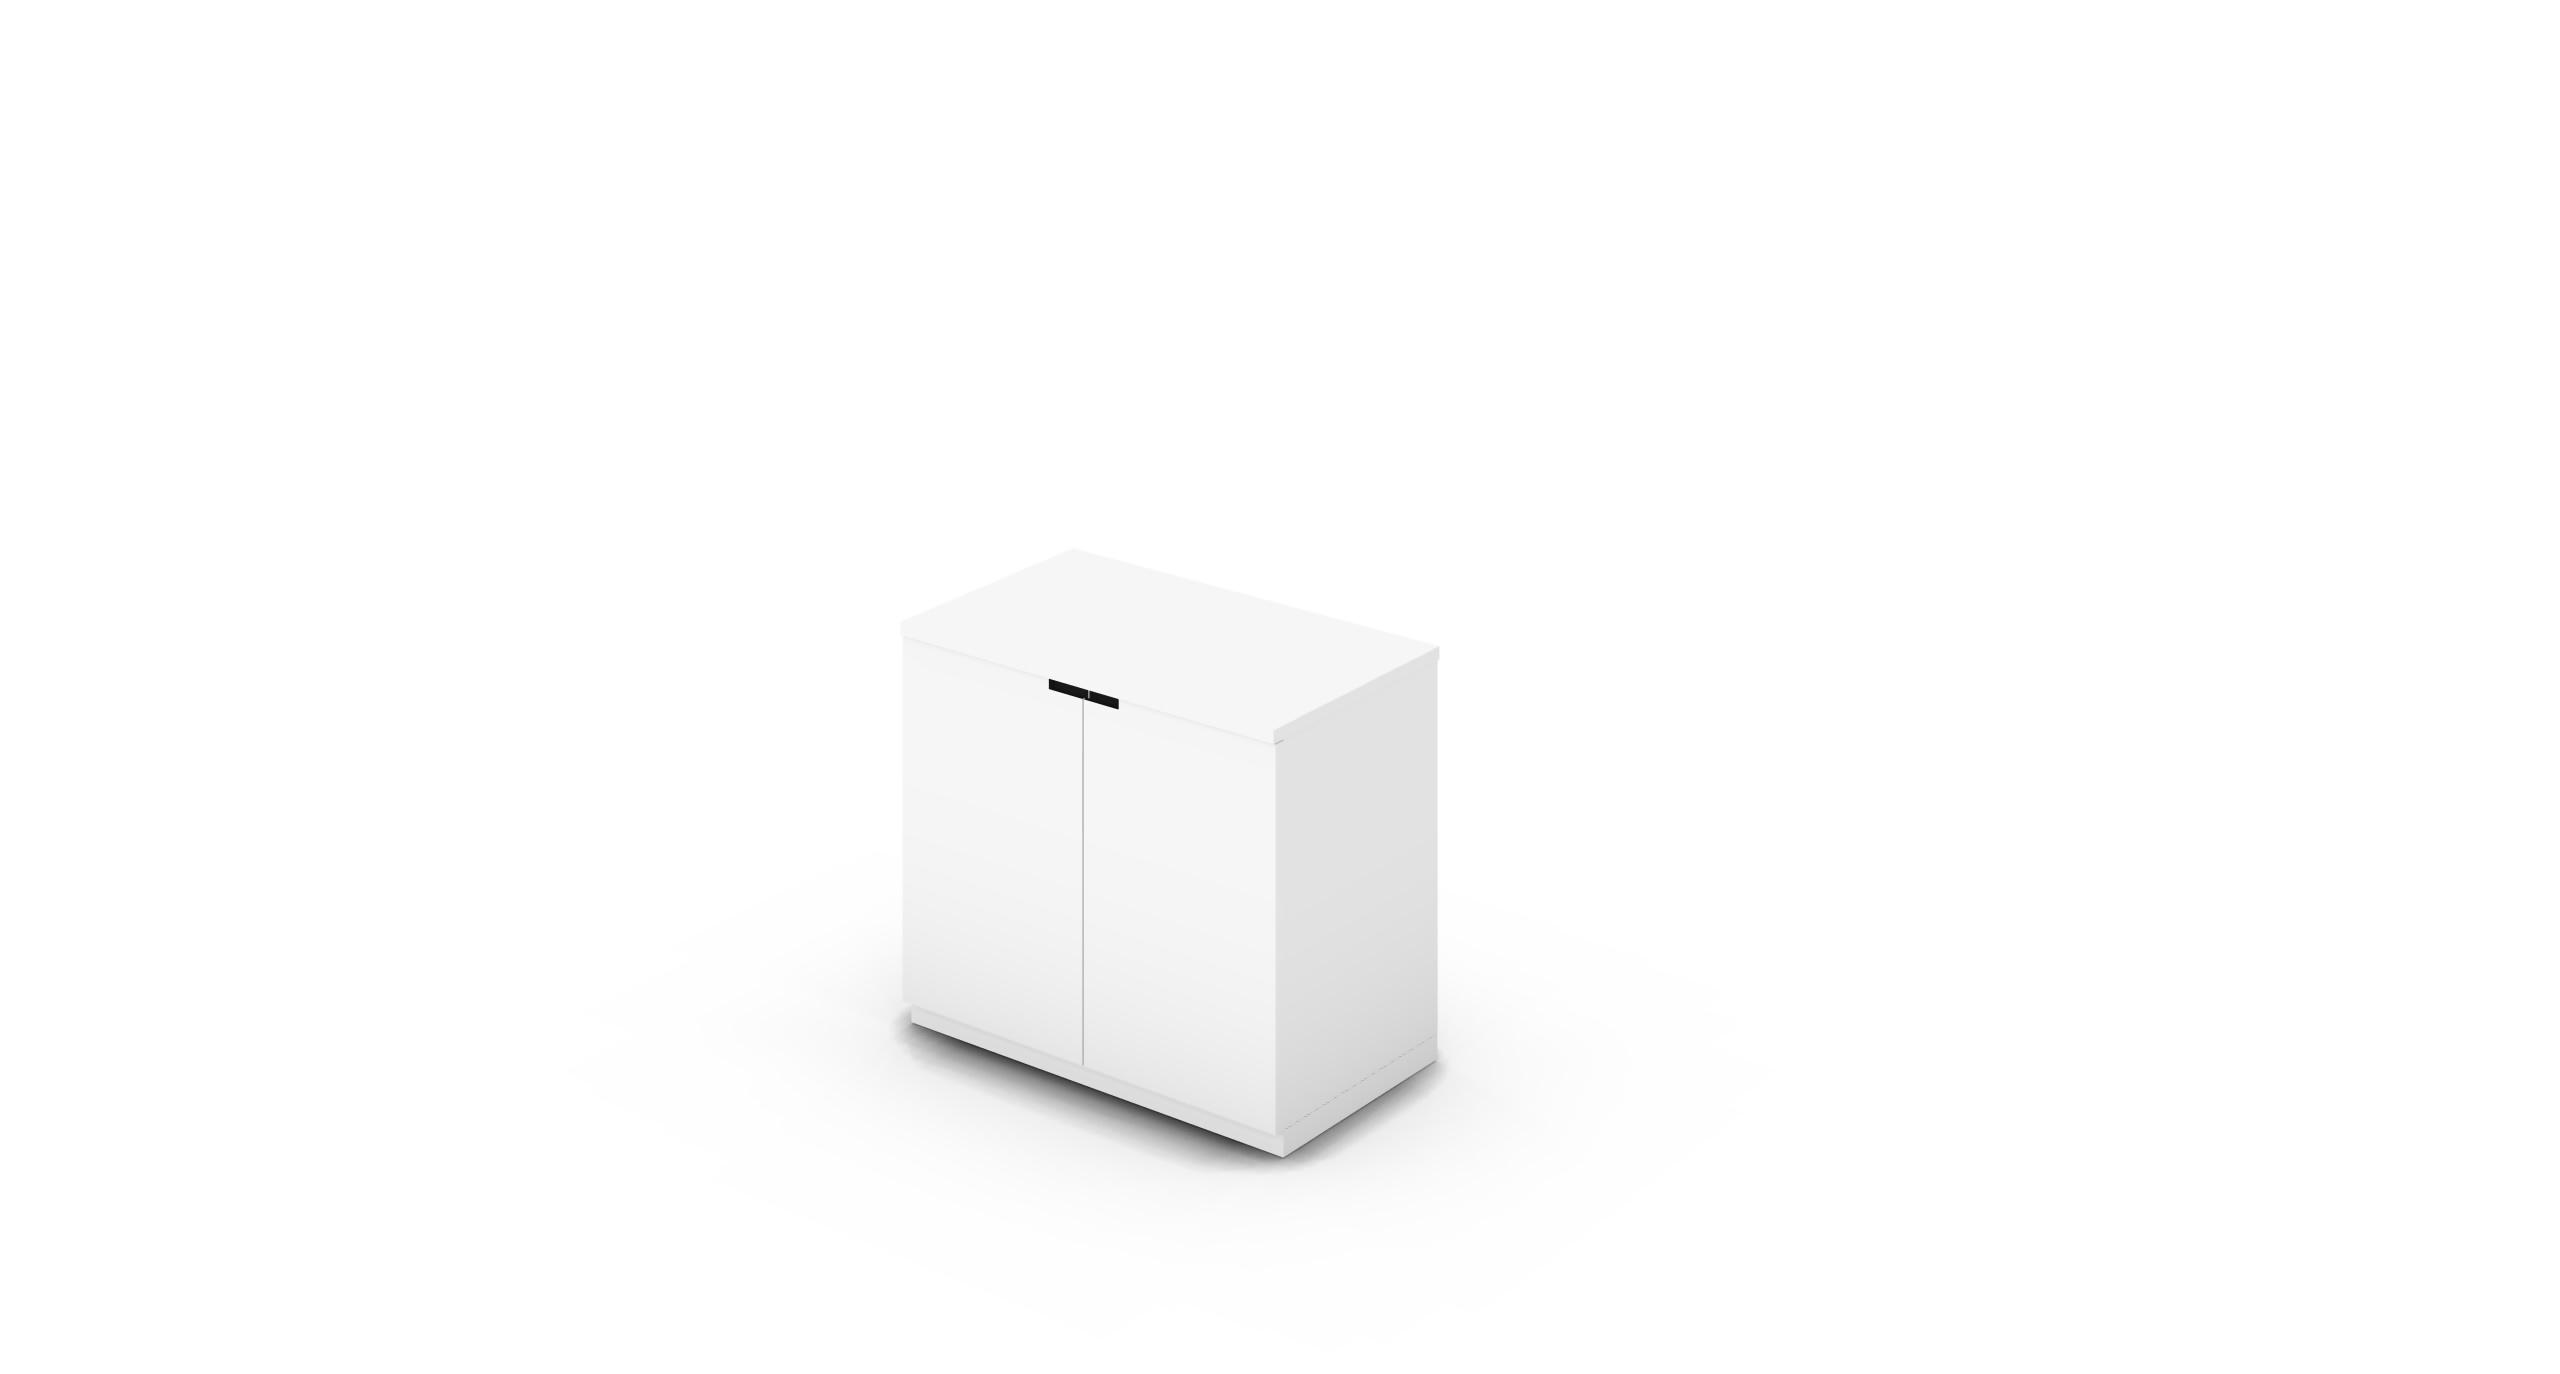 Cabinet_800x450x775_HD_White_CutOut_NoCylinder